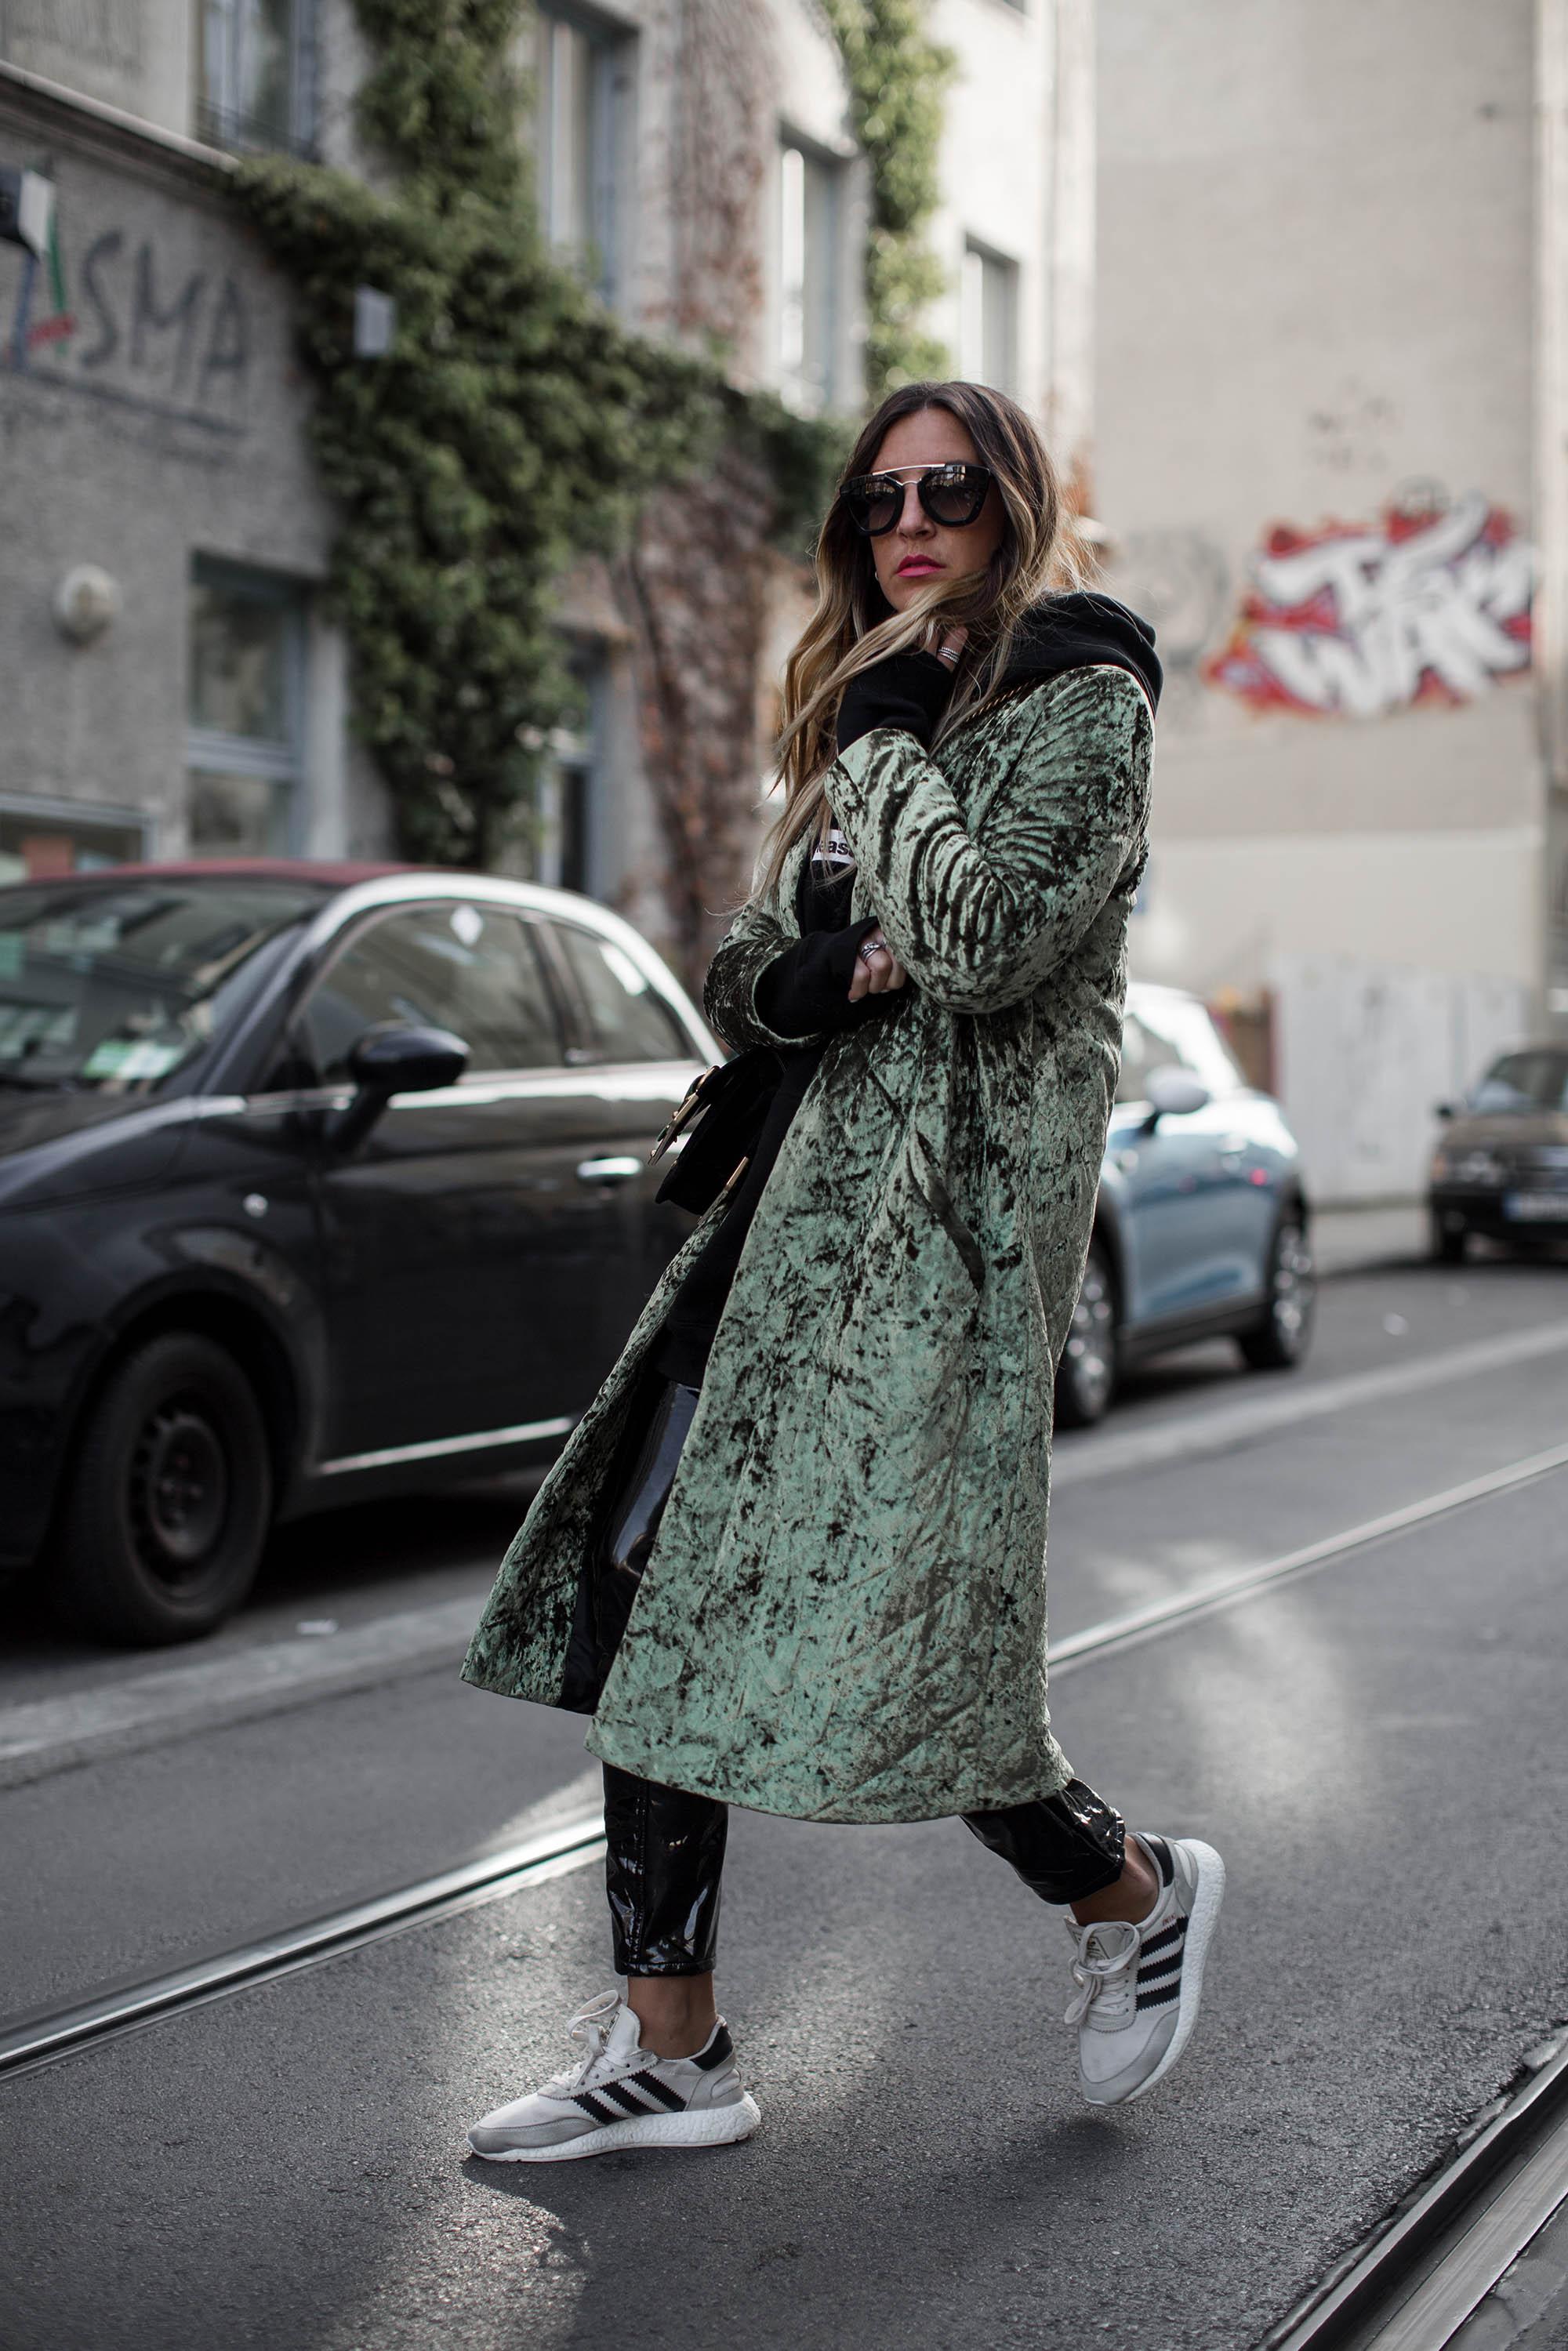 black-palms-samt-sporty-prada-streetstyle-fashionblog-8